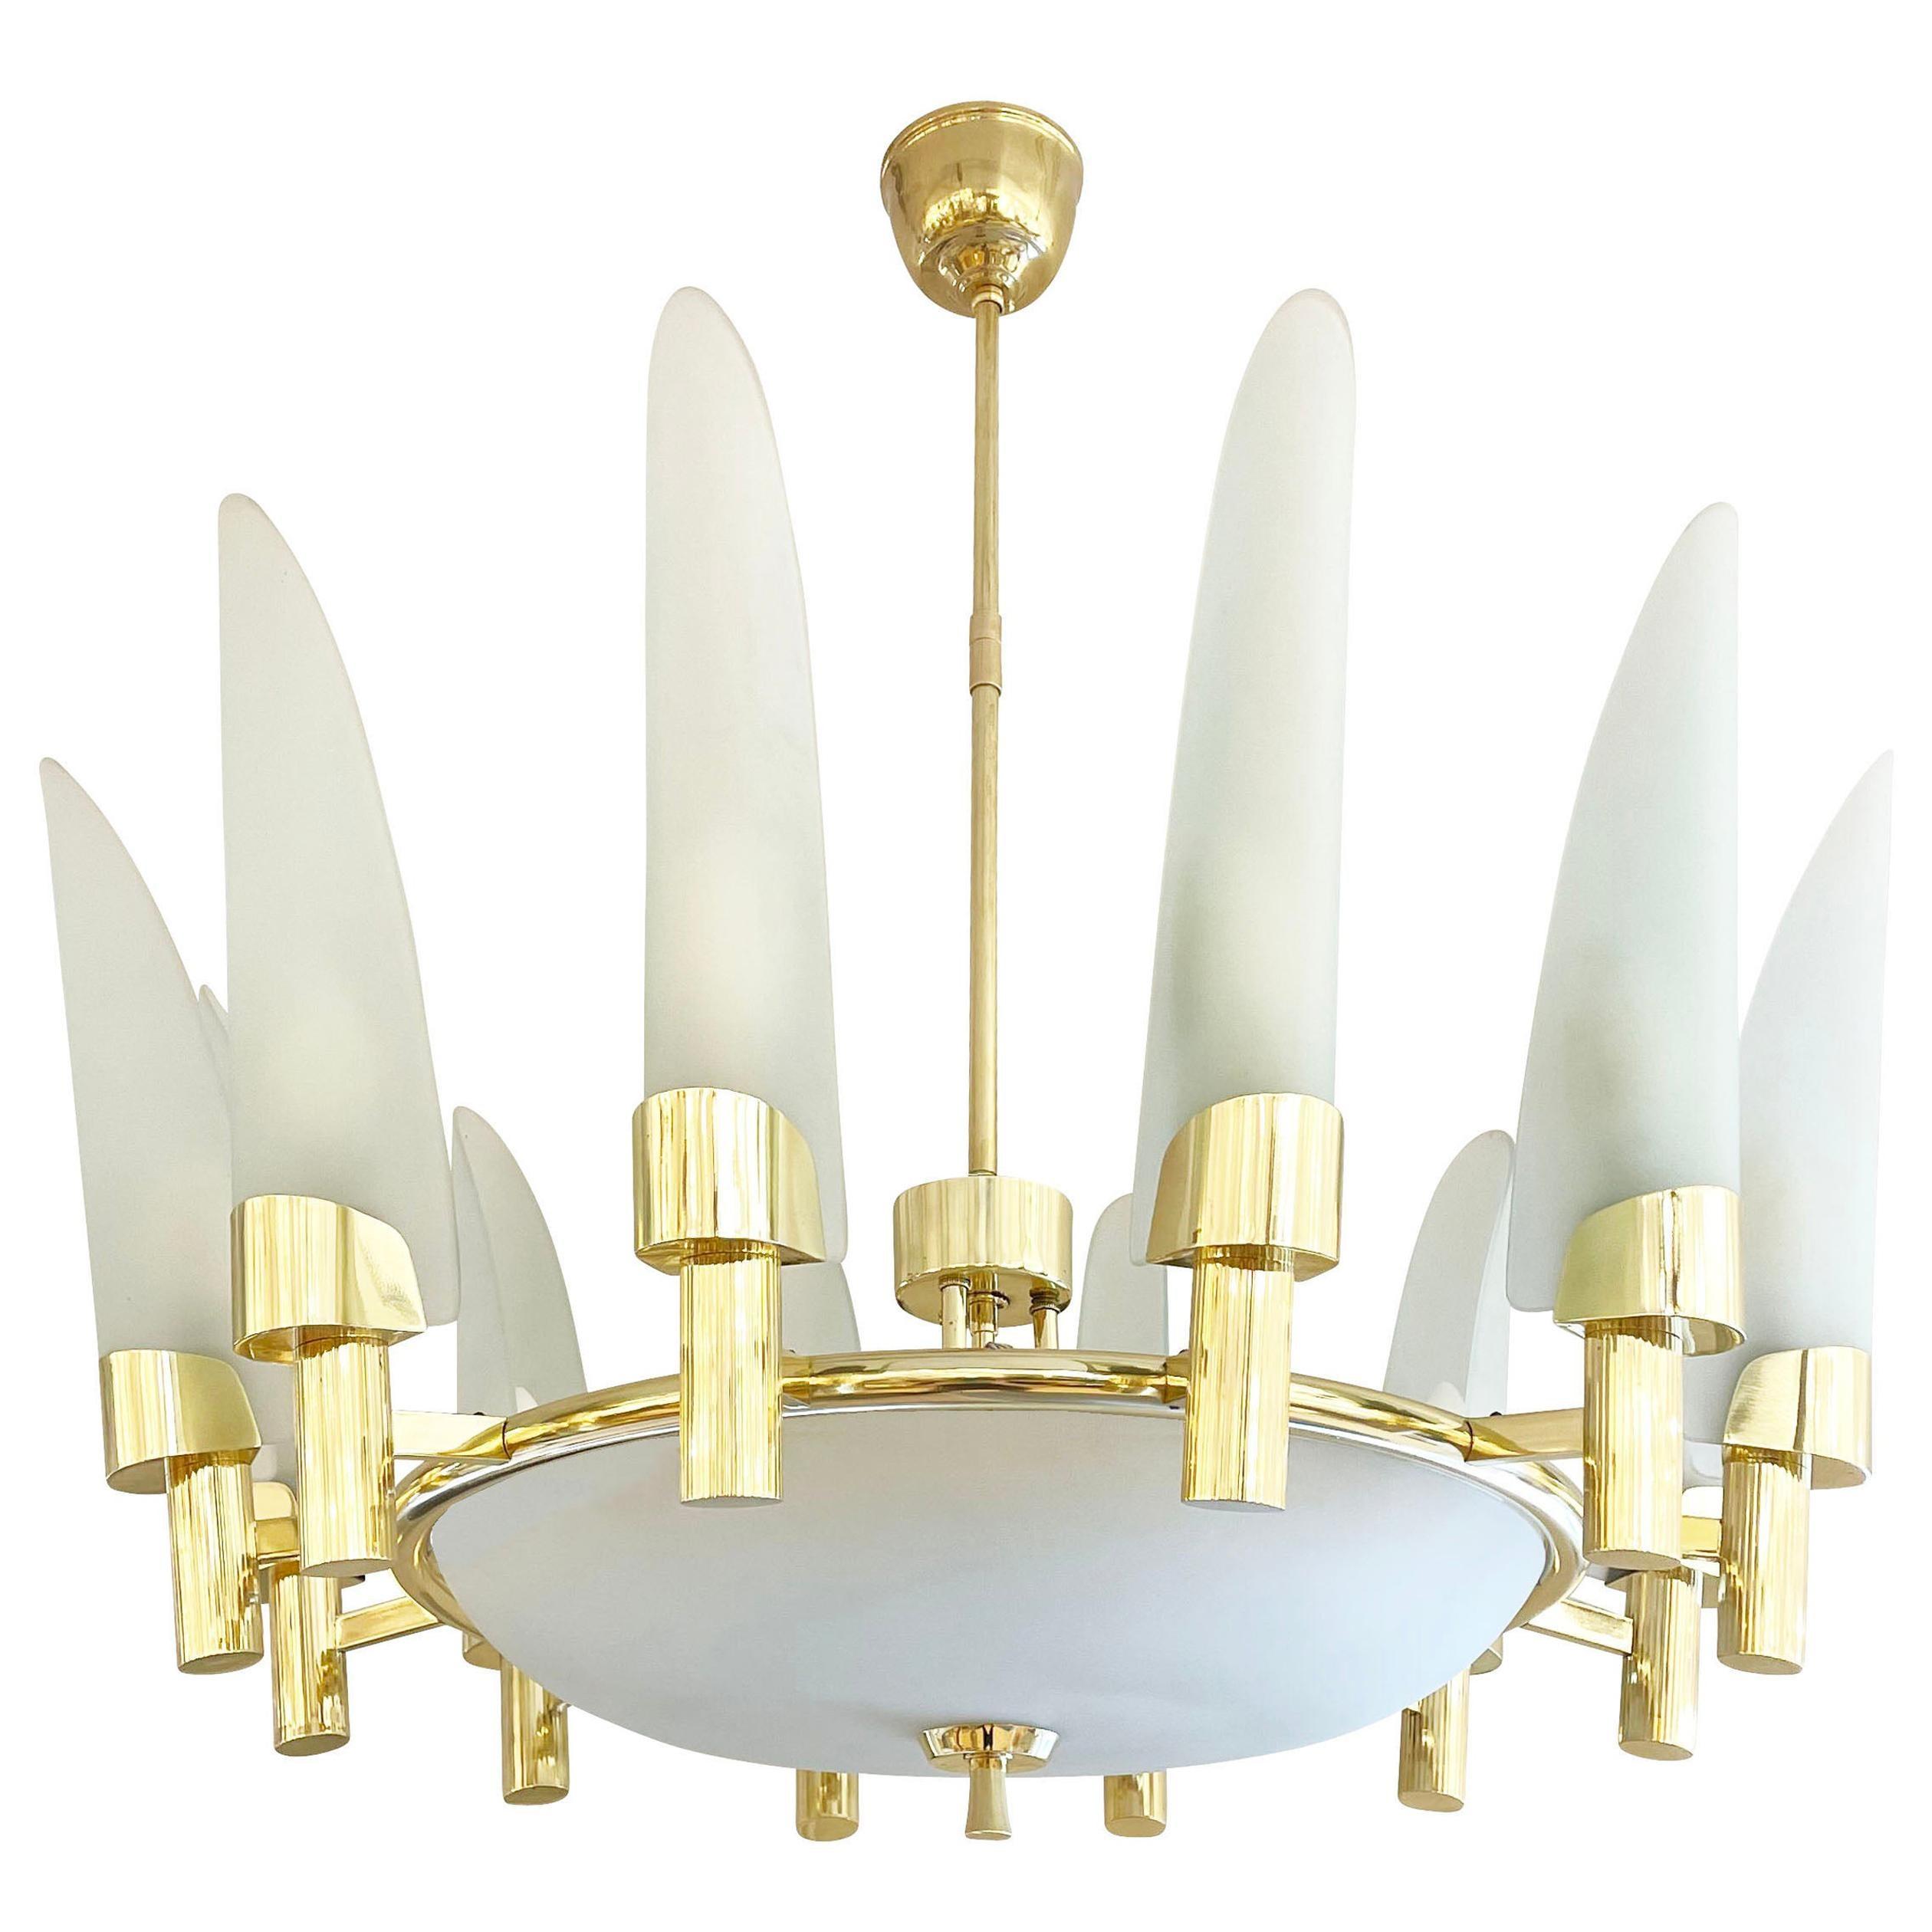 Fontana Arte Attributed Pendant, Italy, 1960s